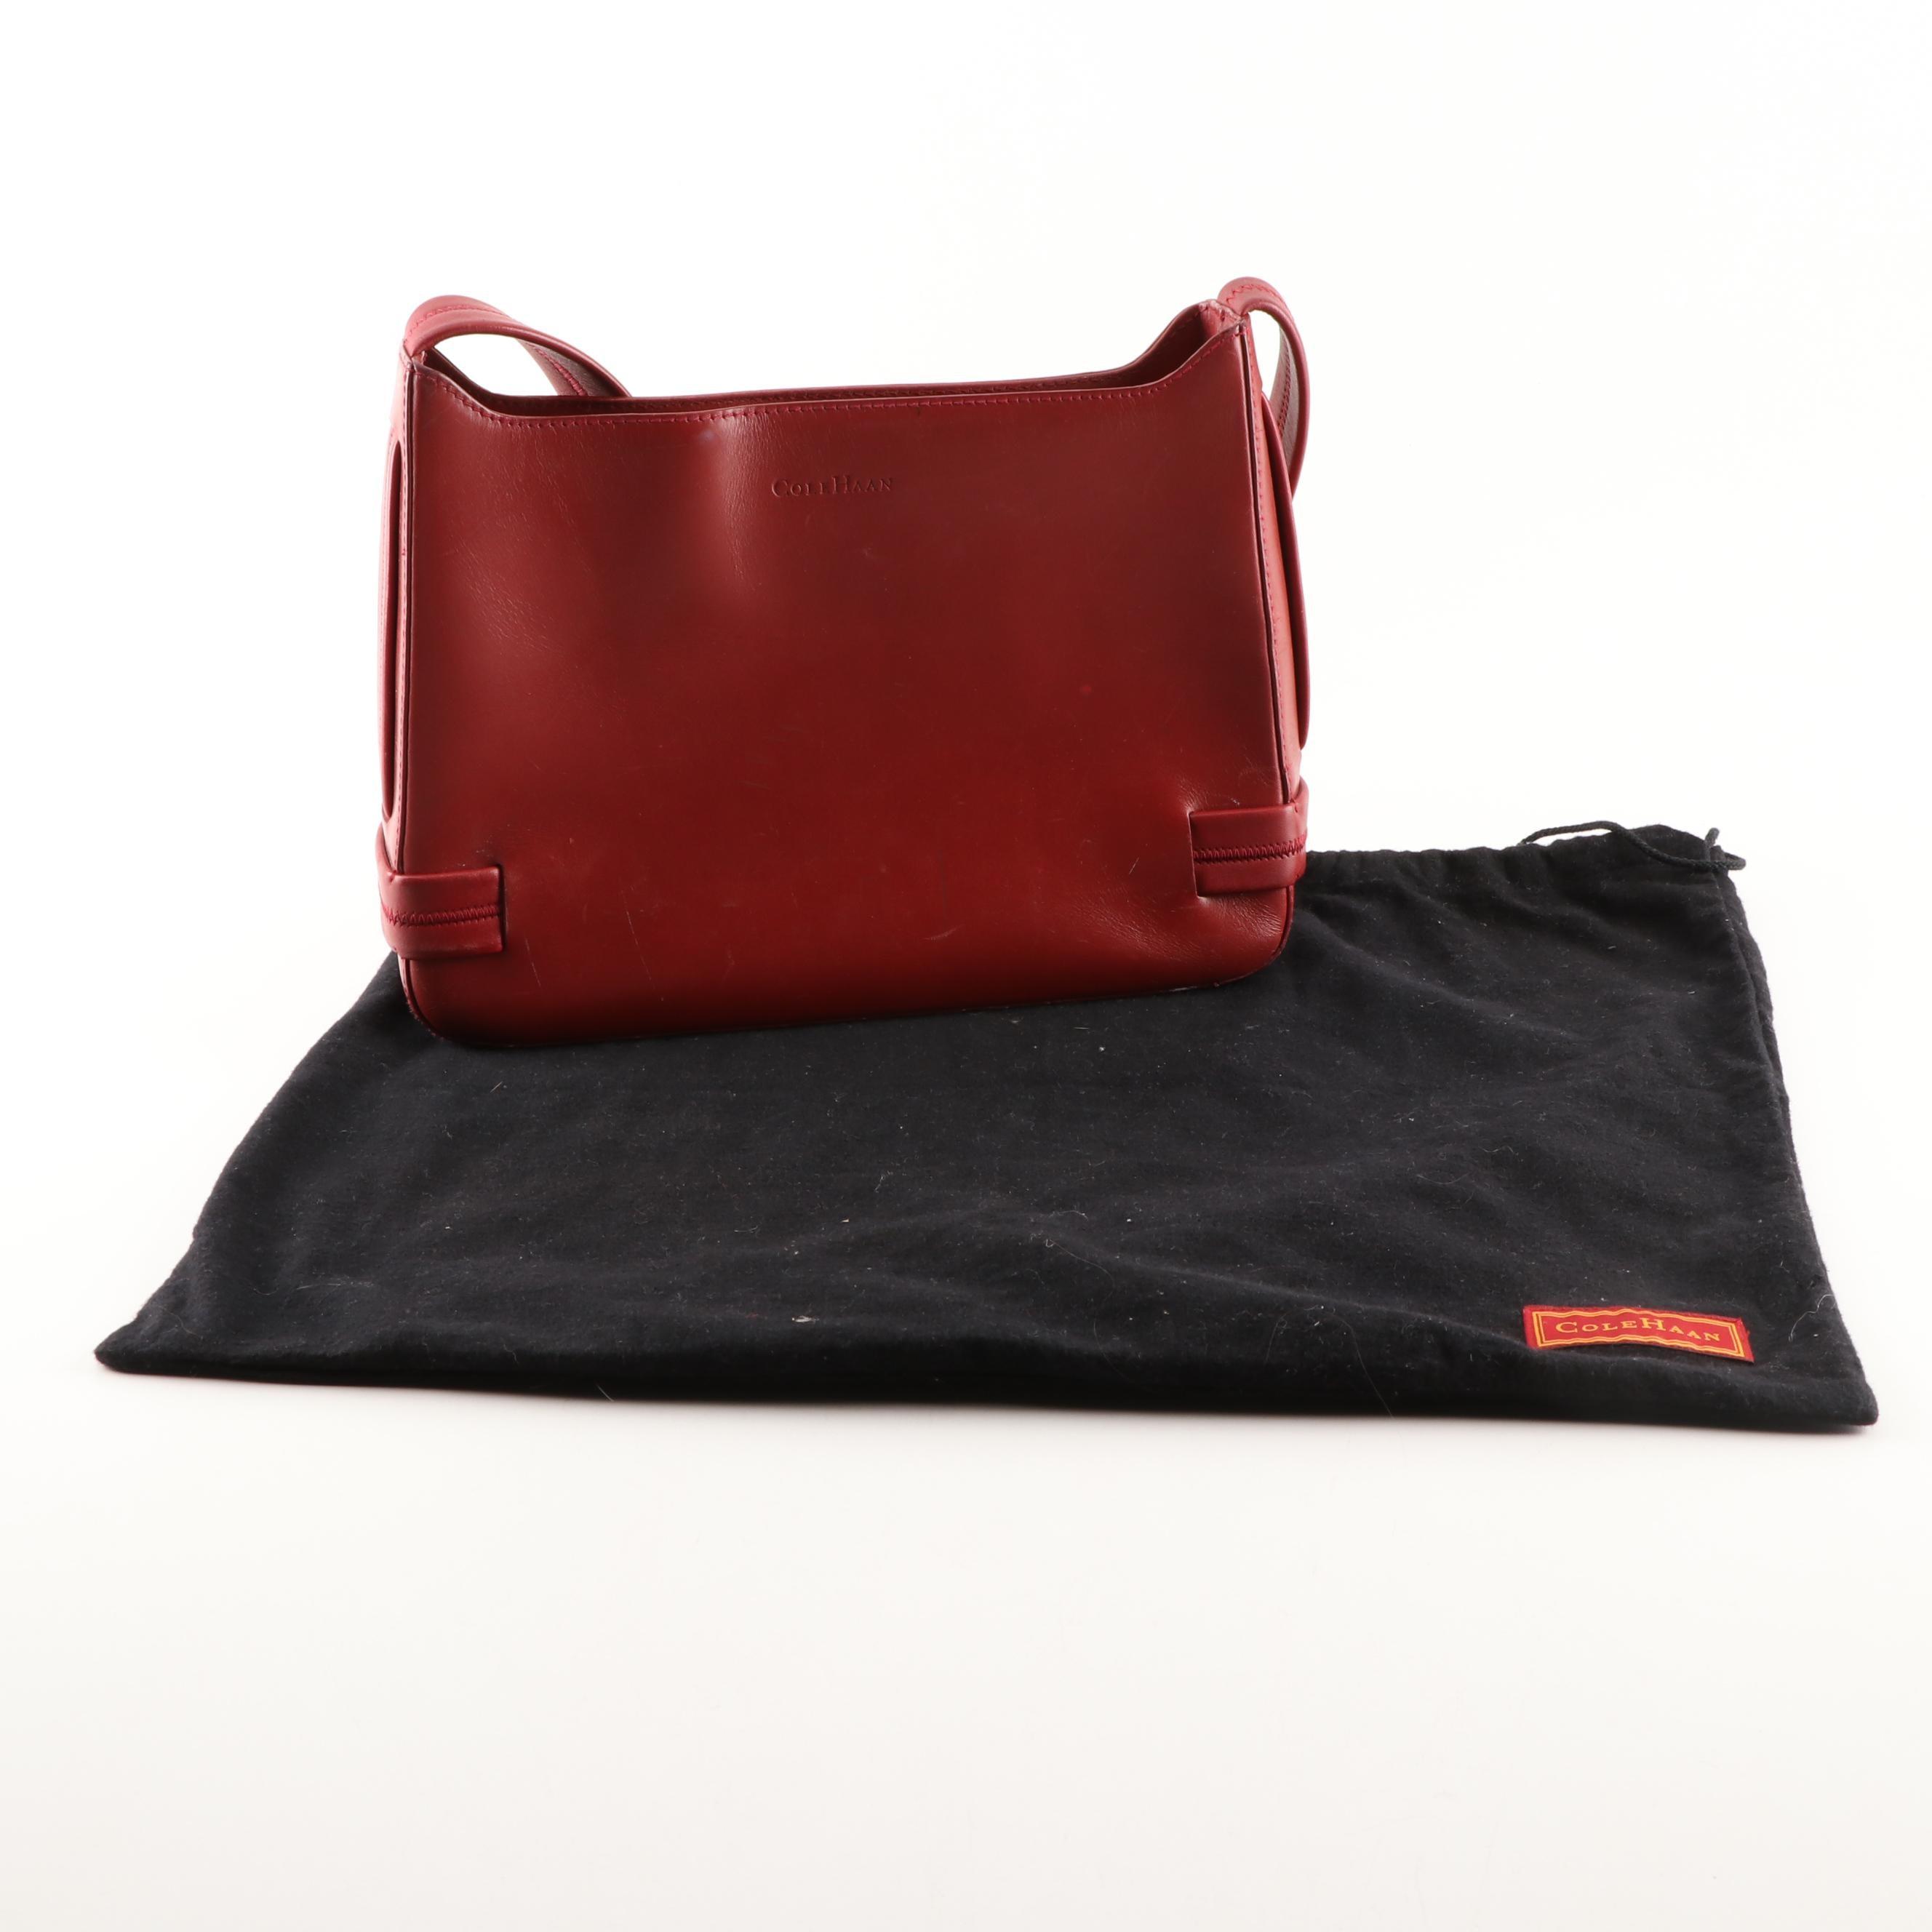 Cole Haan Red Leather Handbag